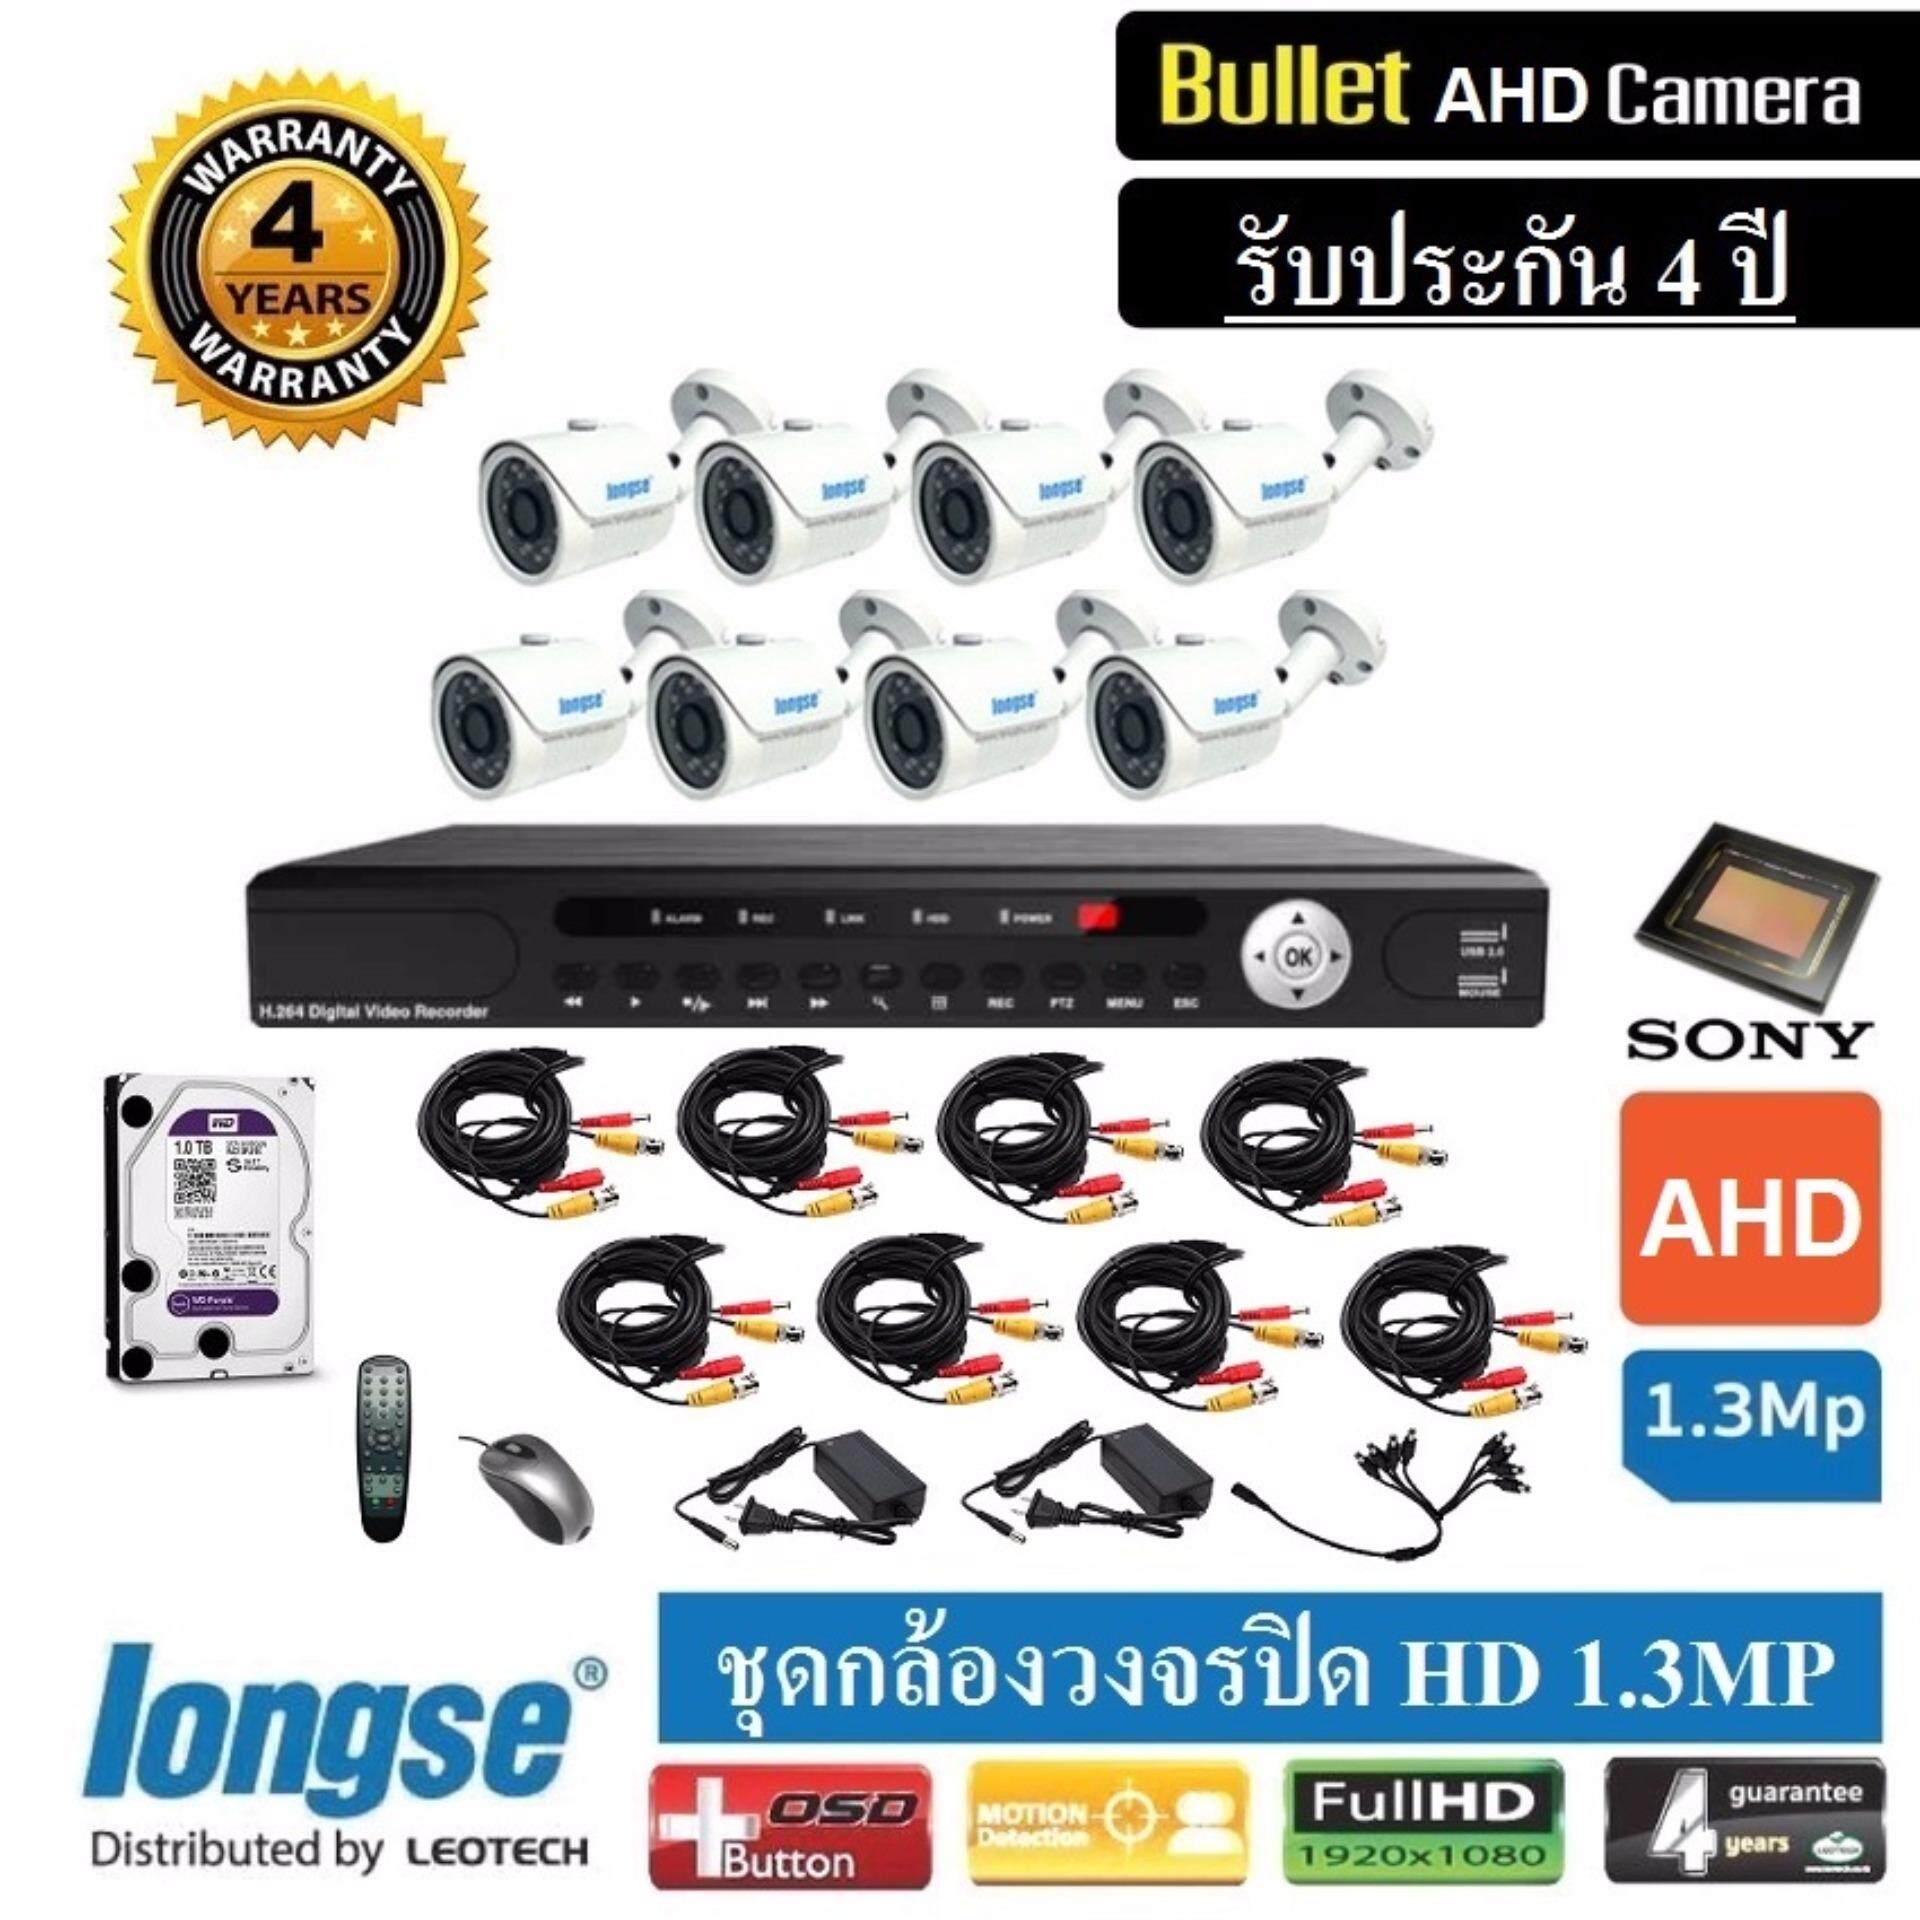 Longse กล้องวงจรปิด CCTV AHD 1.3MP DIY Kit set ชุดกล้องวงจรปิด 8 กล้อง แบบสำเร็จรูป พร้อม HDD 1TB